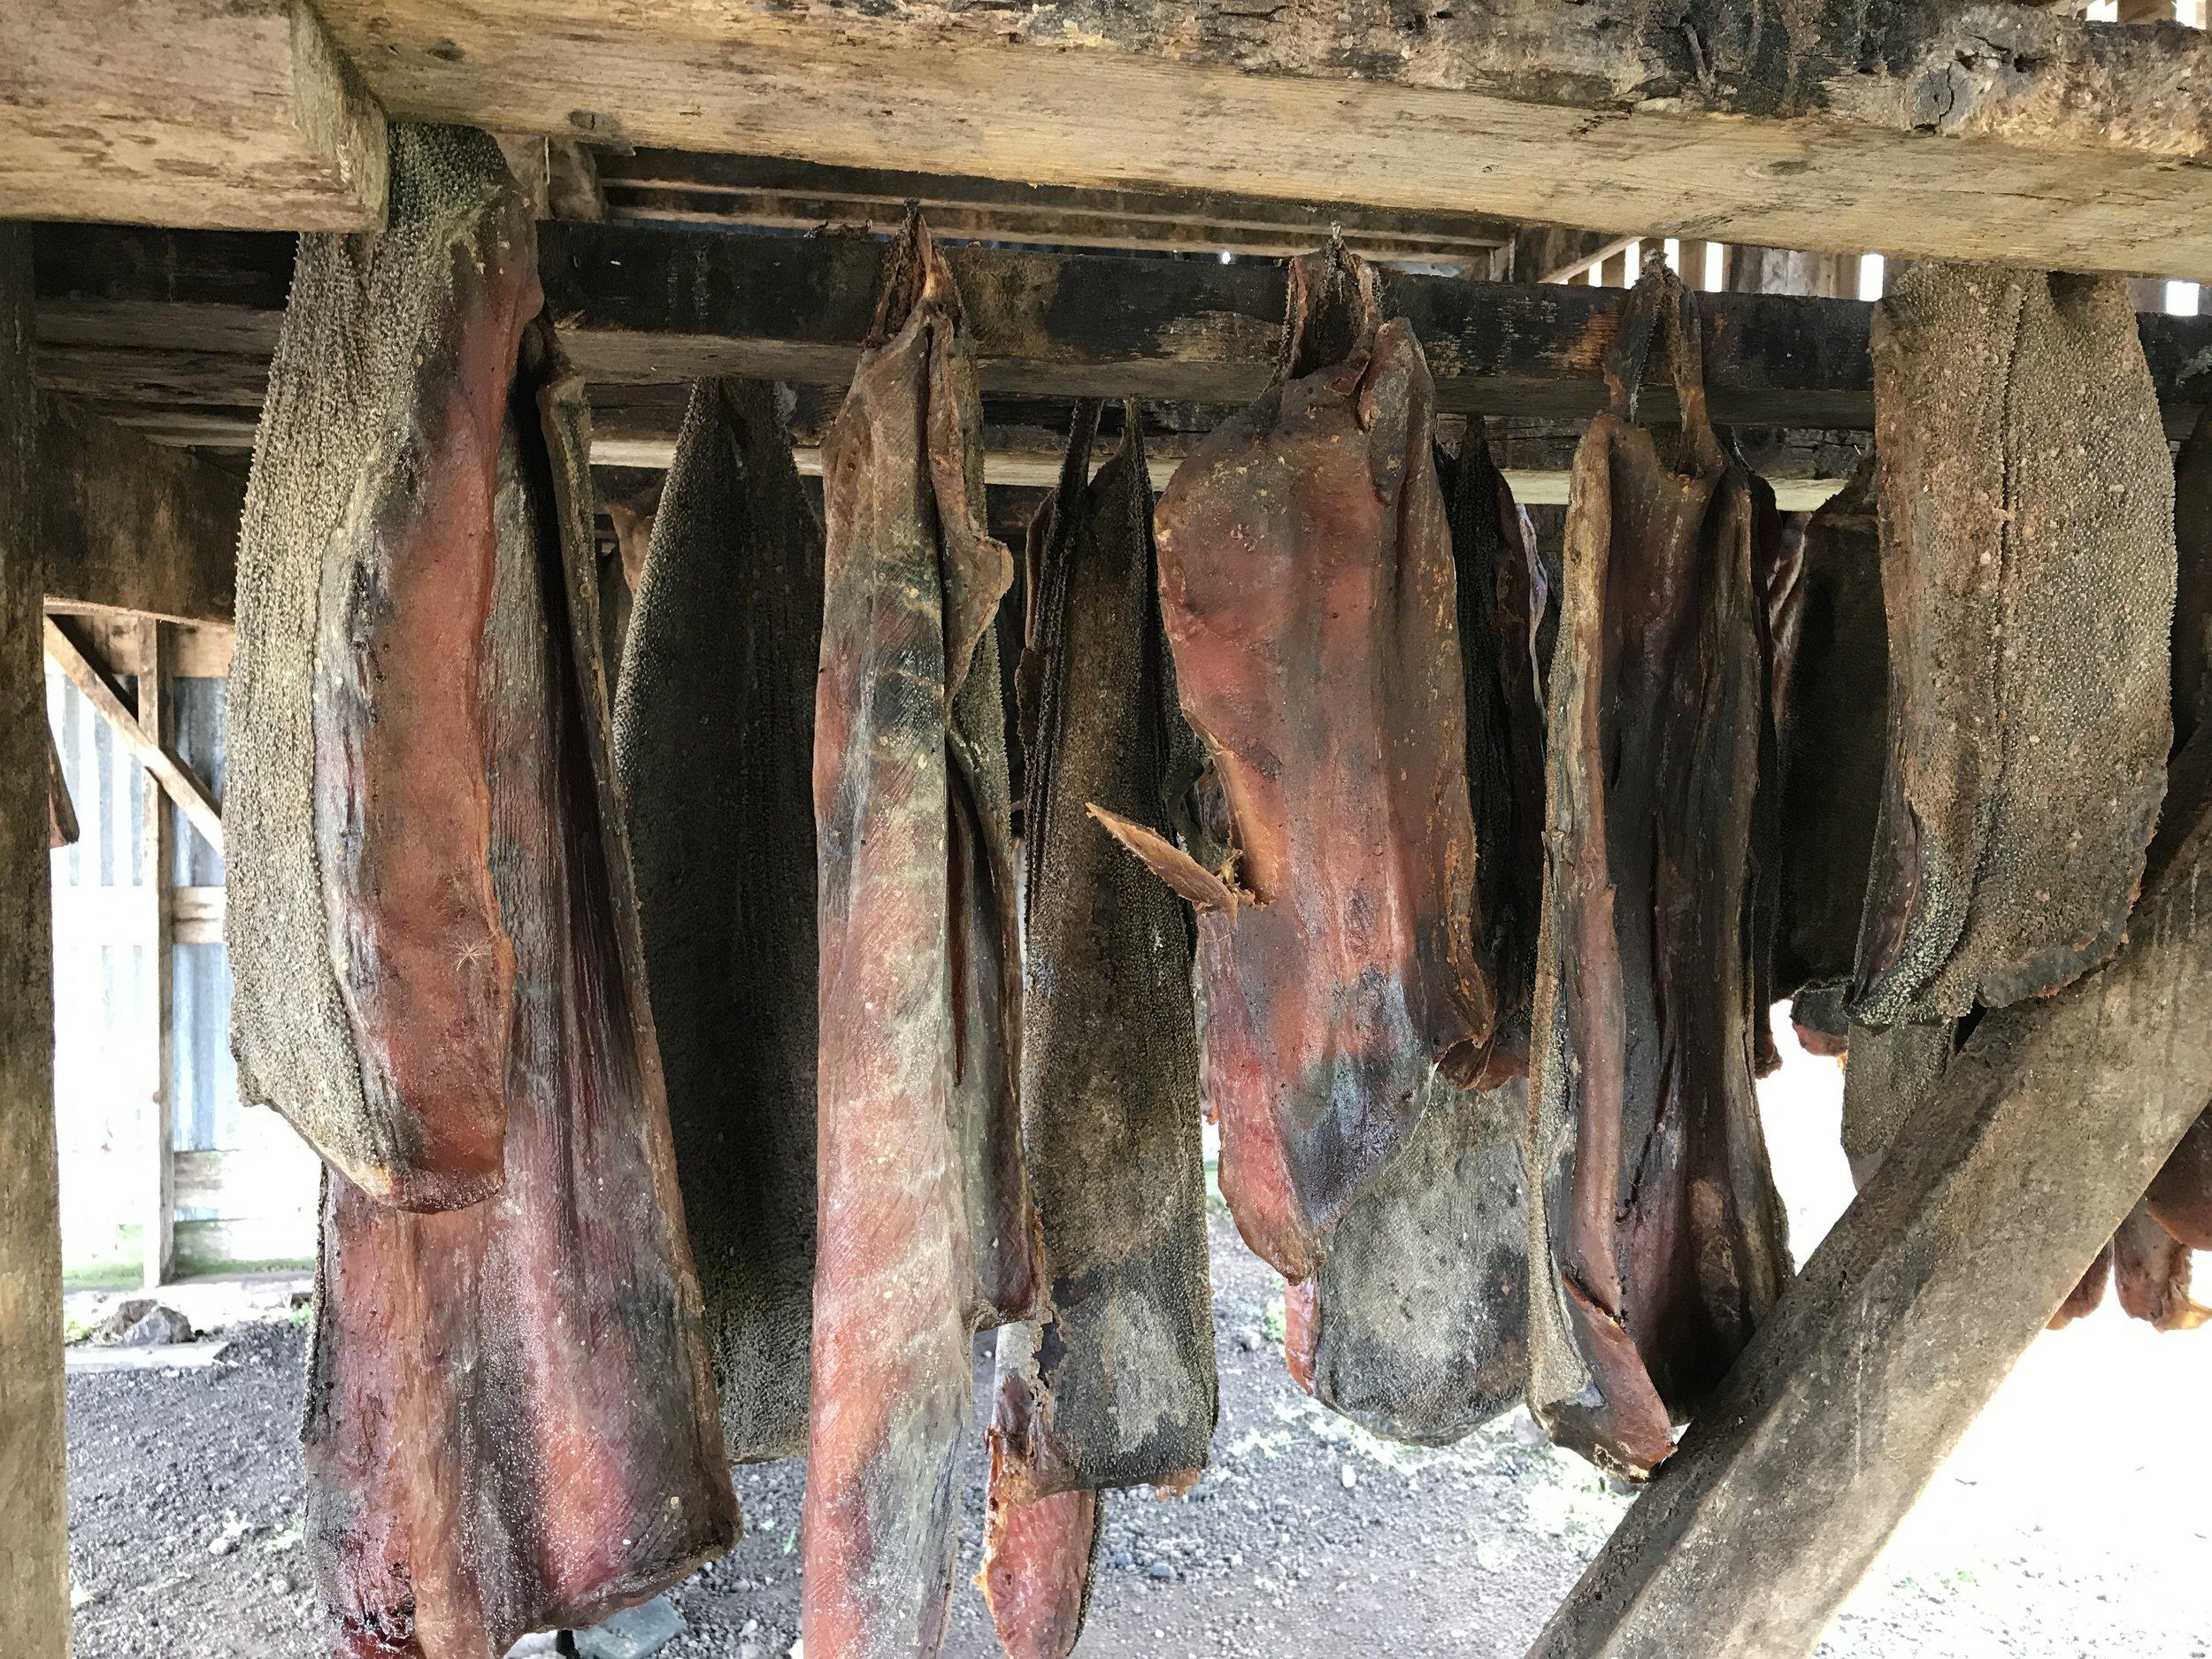 Drying shark